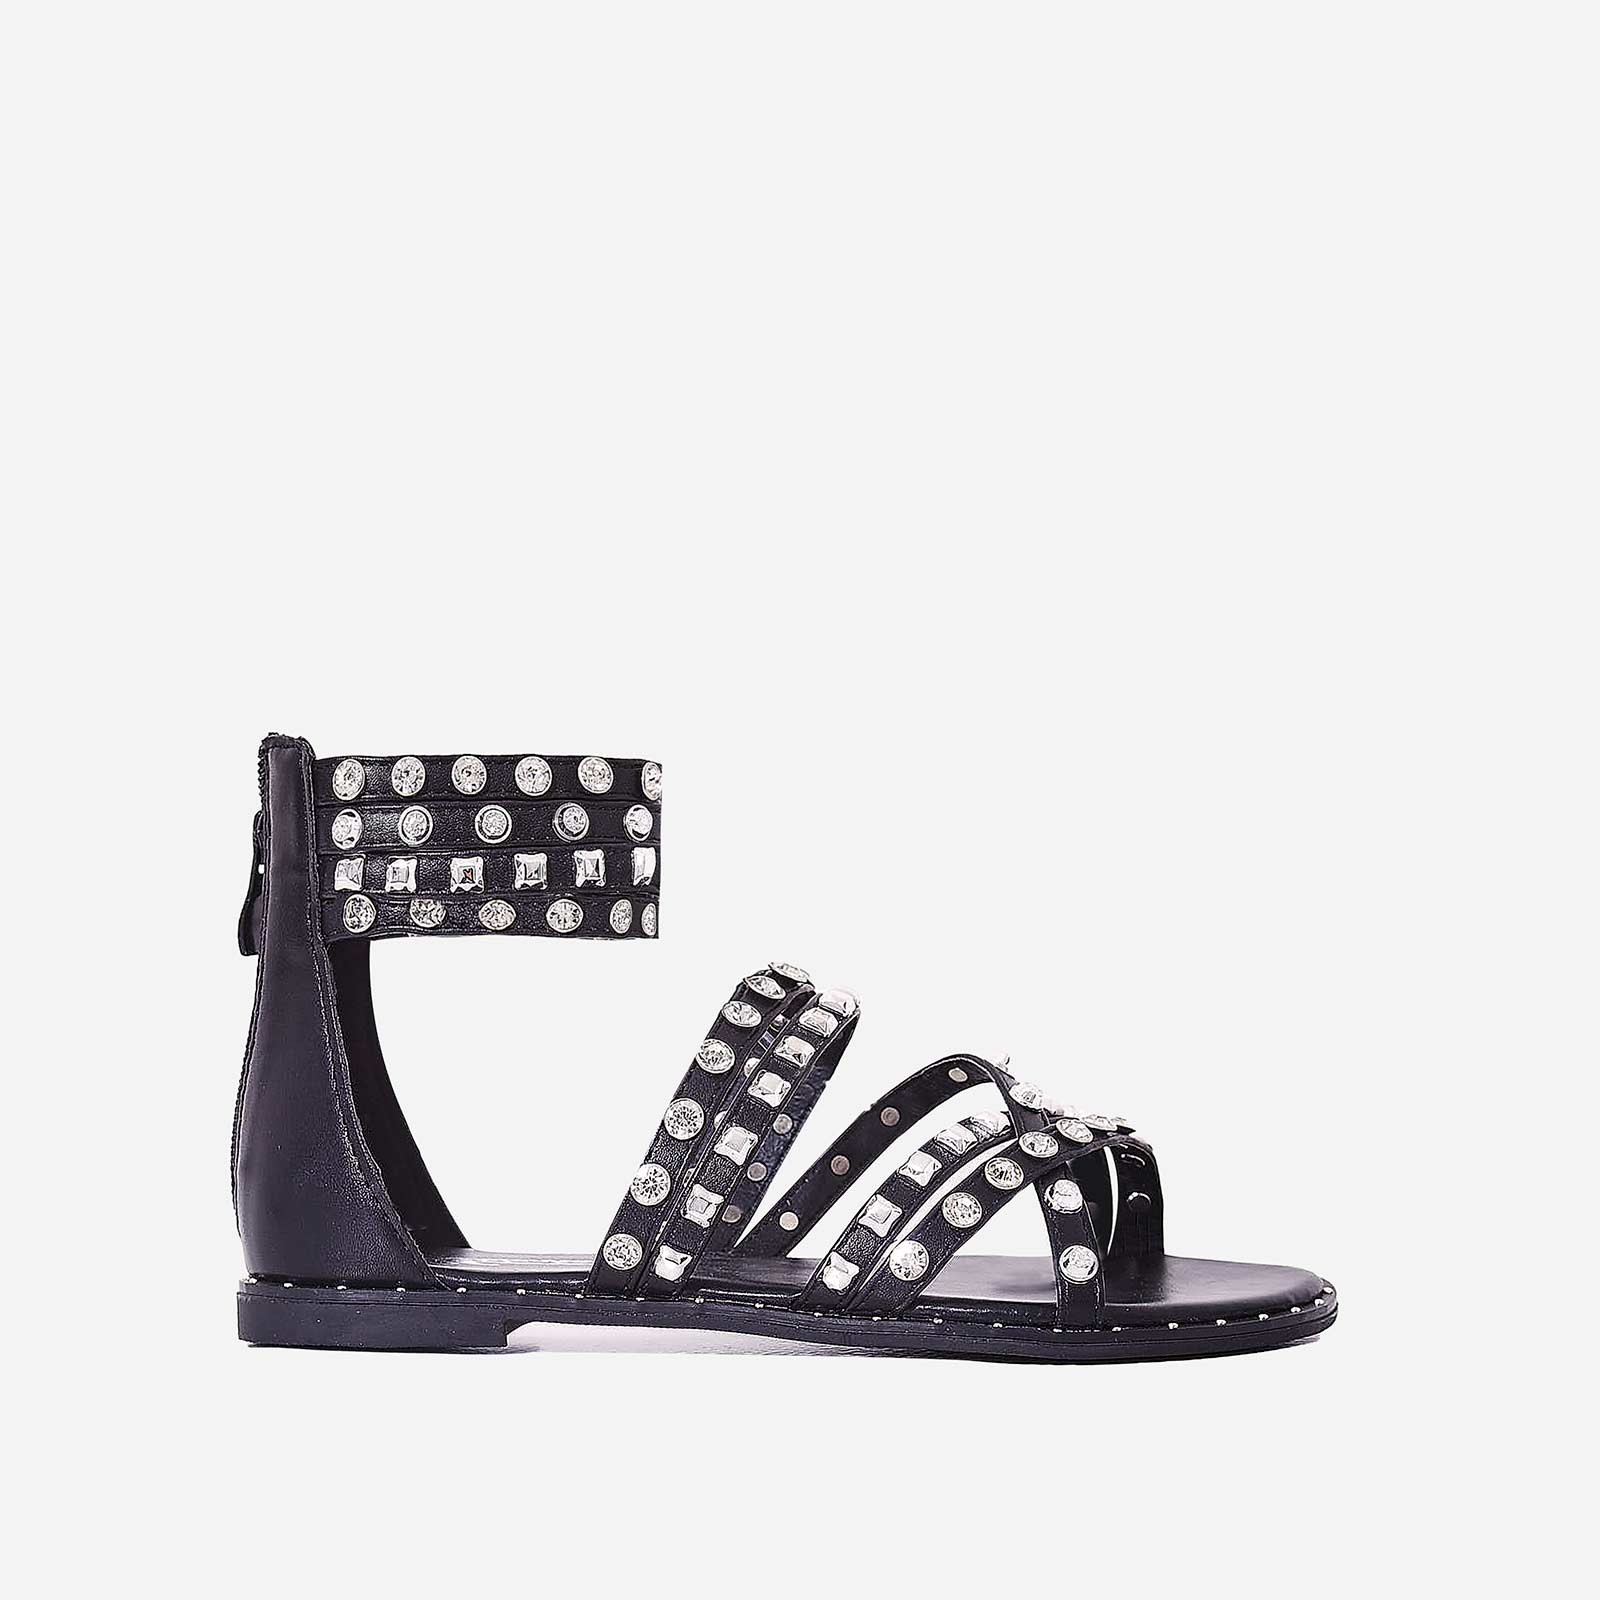 Zephyr Crystal Studded Gladiator Sandal In Black Faux Leather